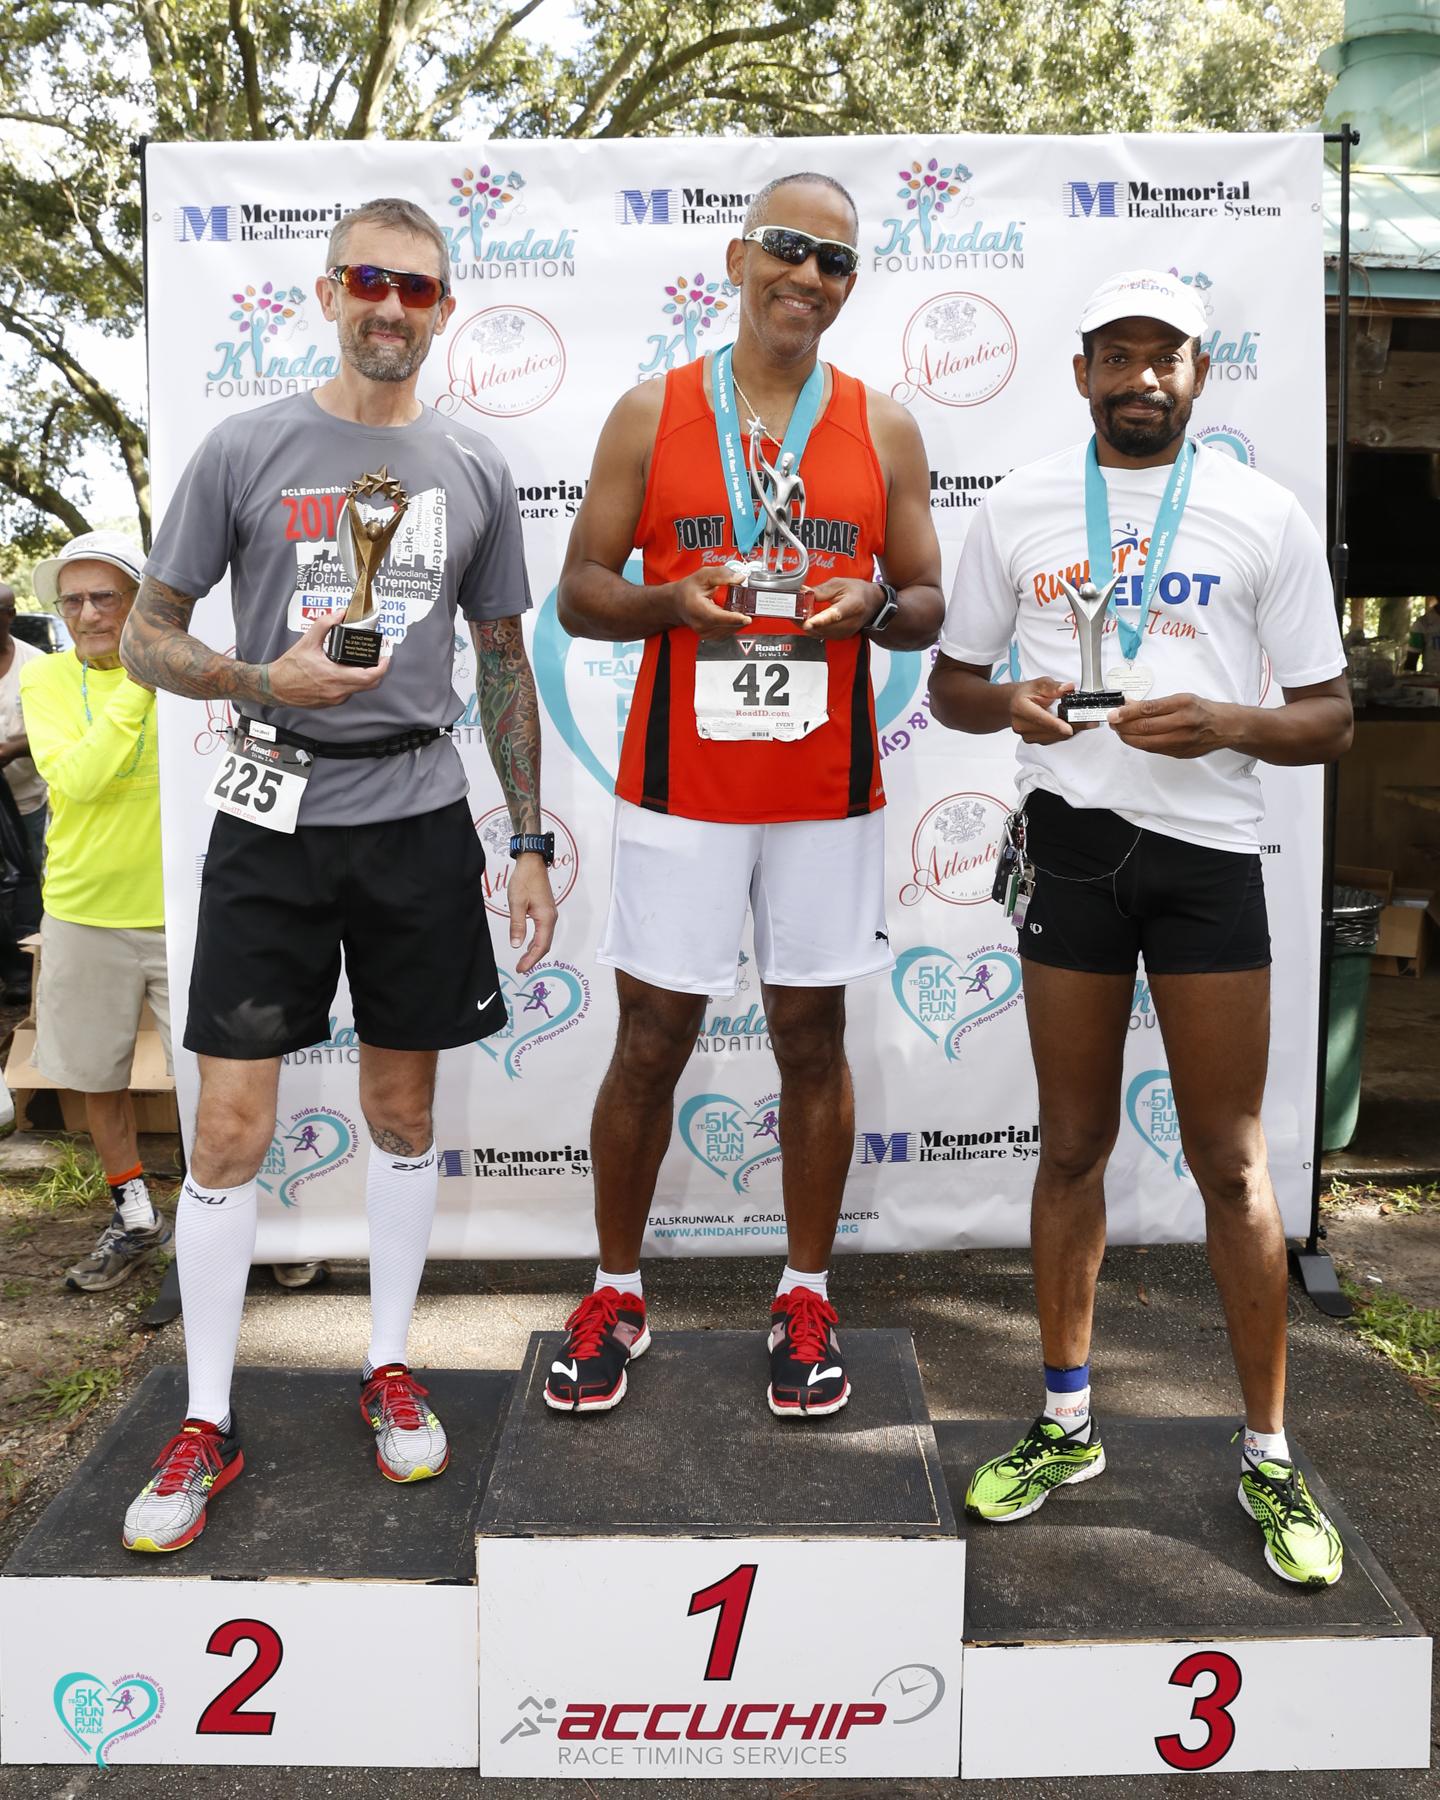 KF 0813 - Florida Teal 5K Run/ Fun Walk 2016